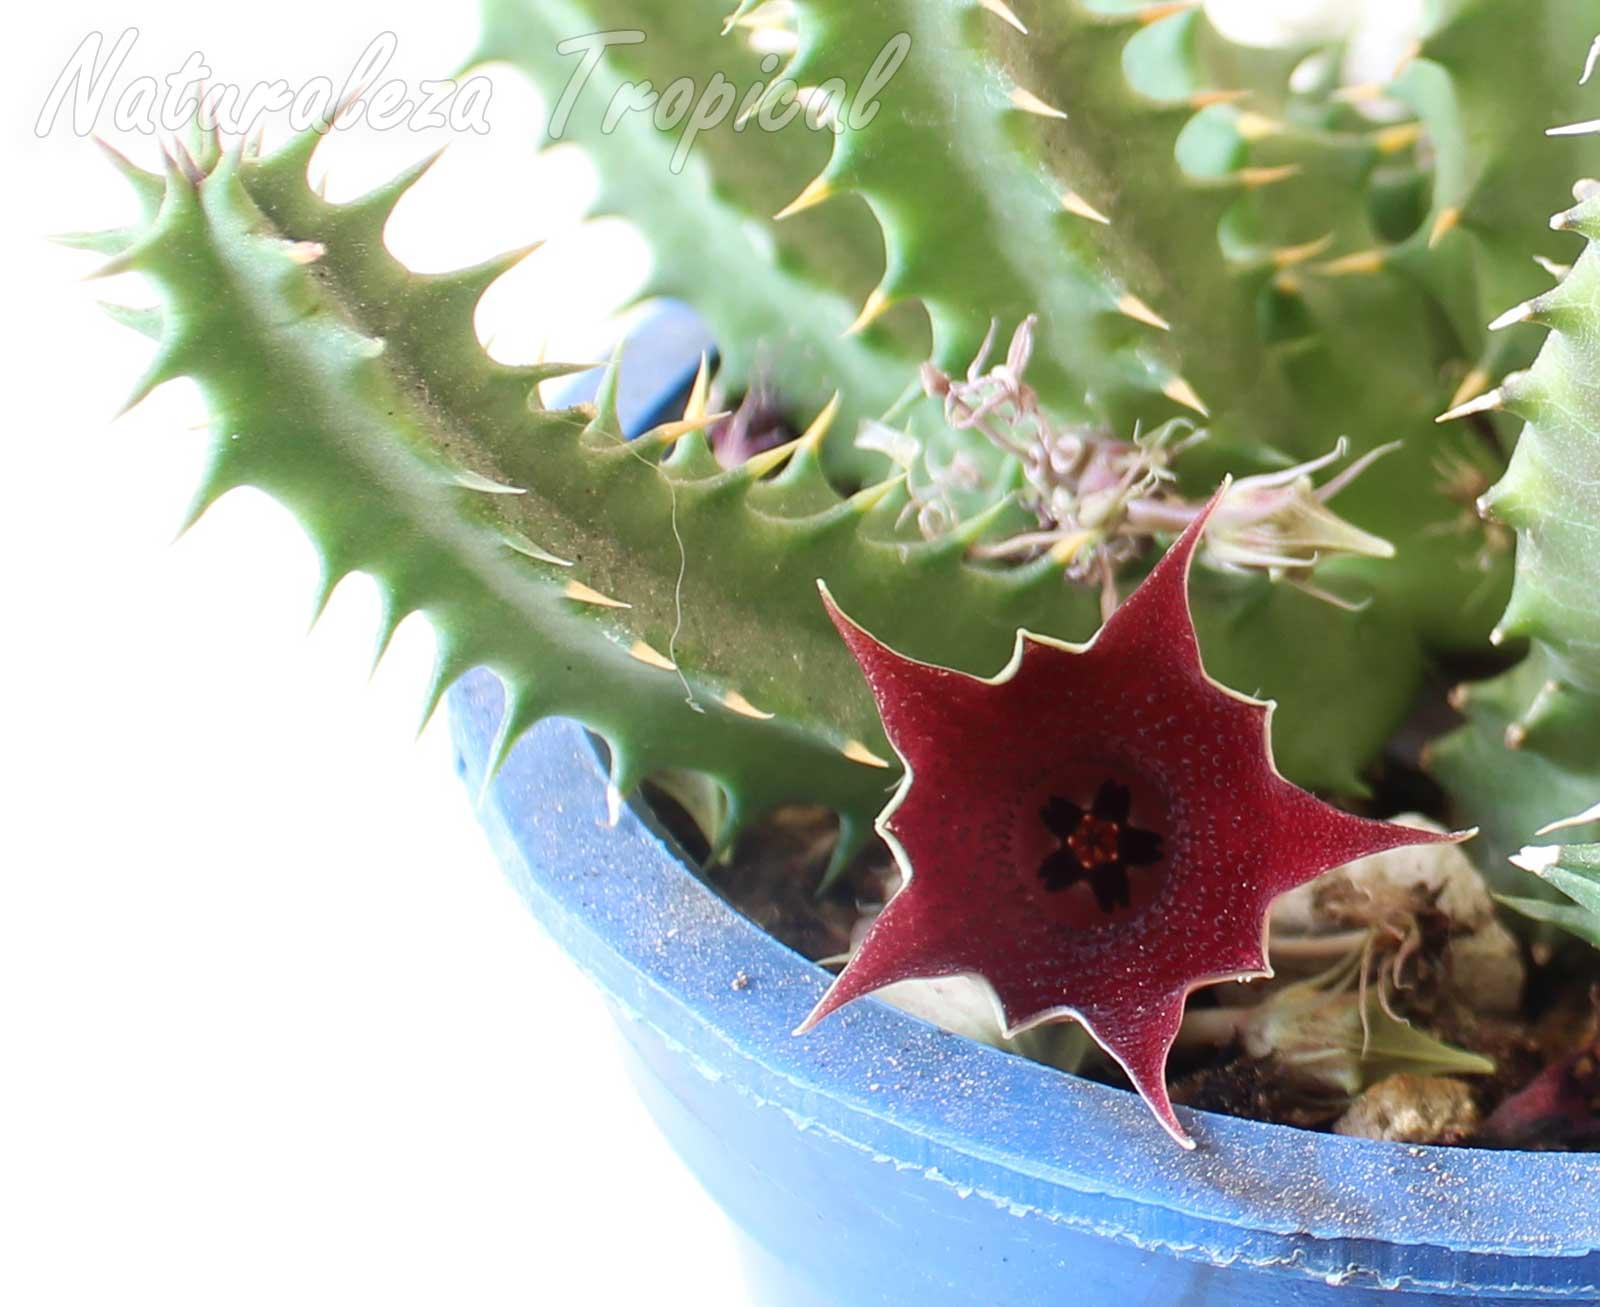 Detalles de la flor de la planta suculenta Huernia x keniensis